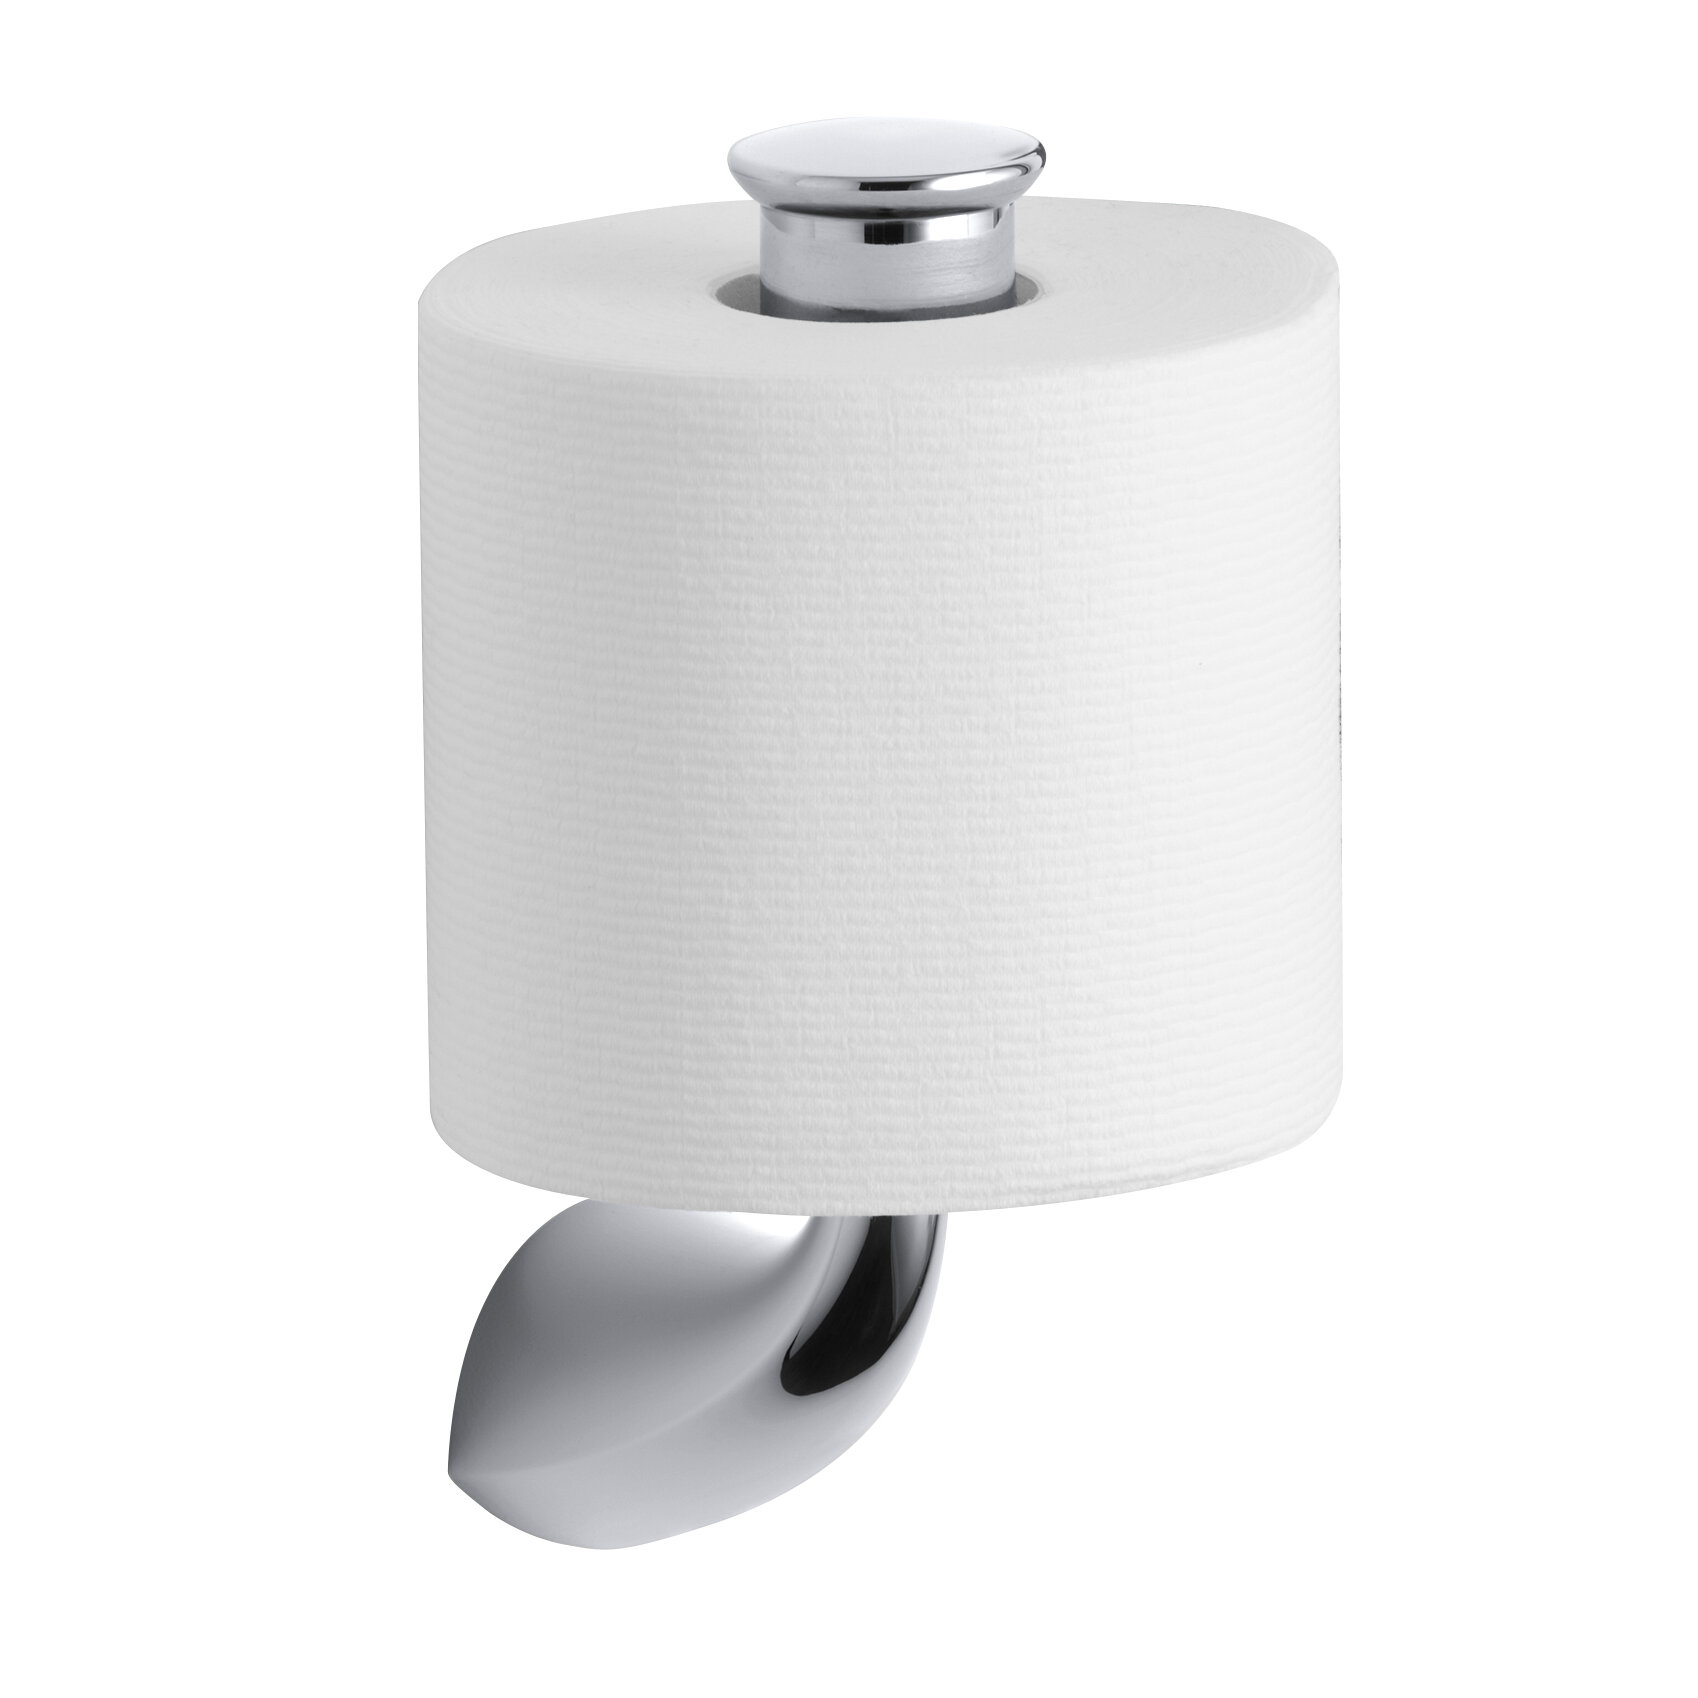 Extra Toilet Paper Holder Wayfair